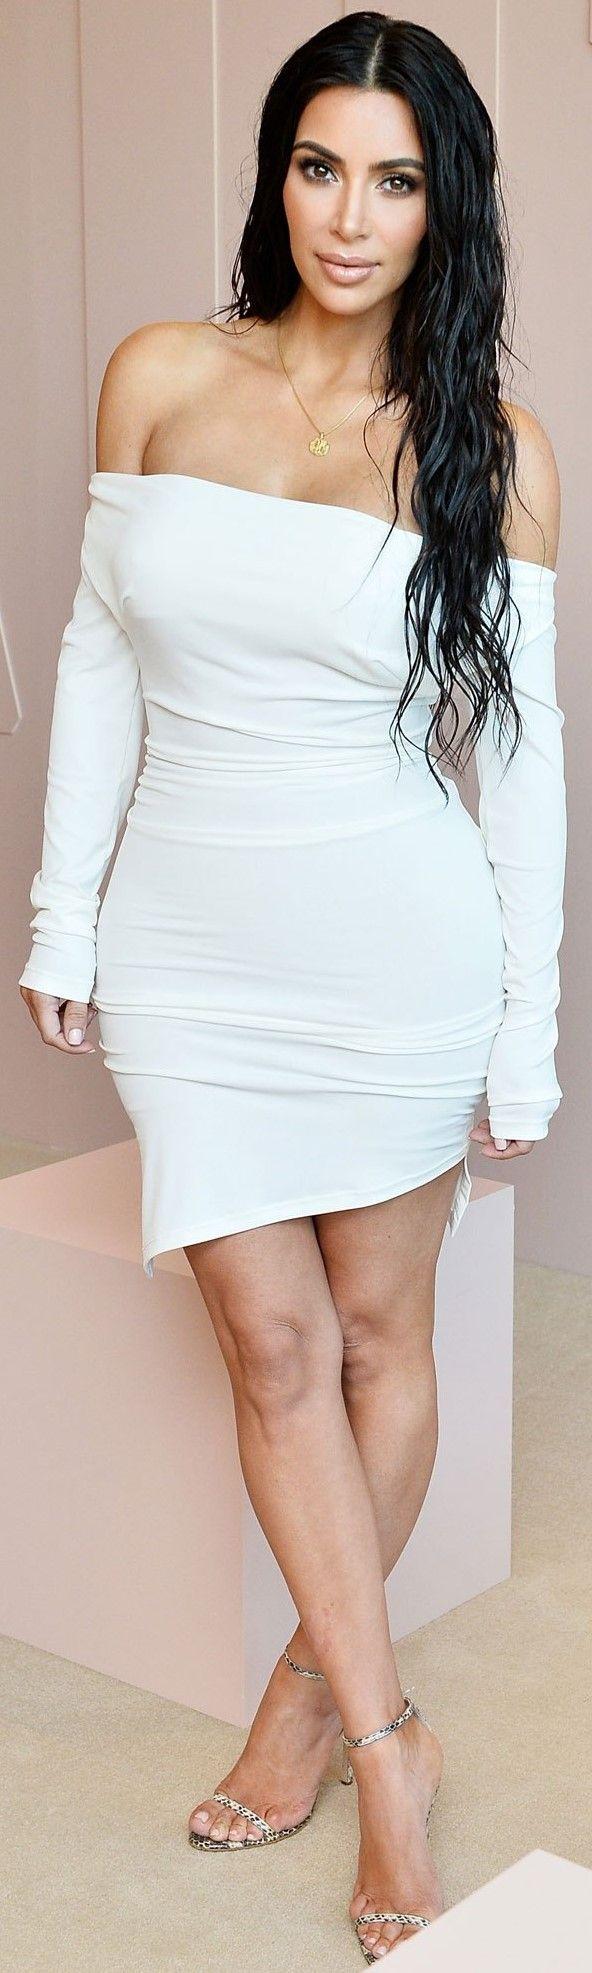 Kim Kardashian   Pinterest mdoretto